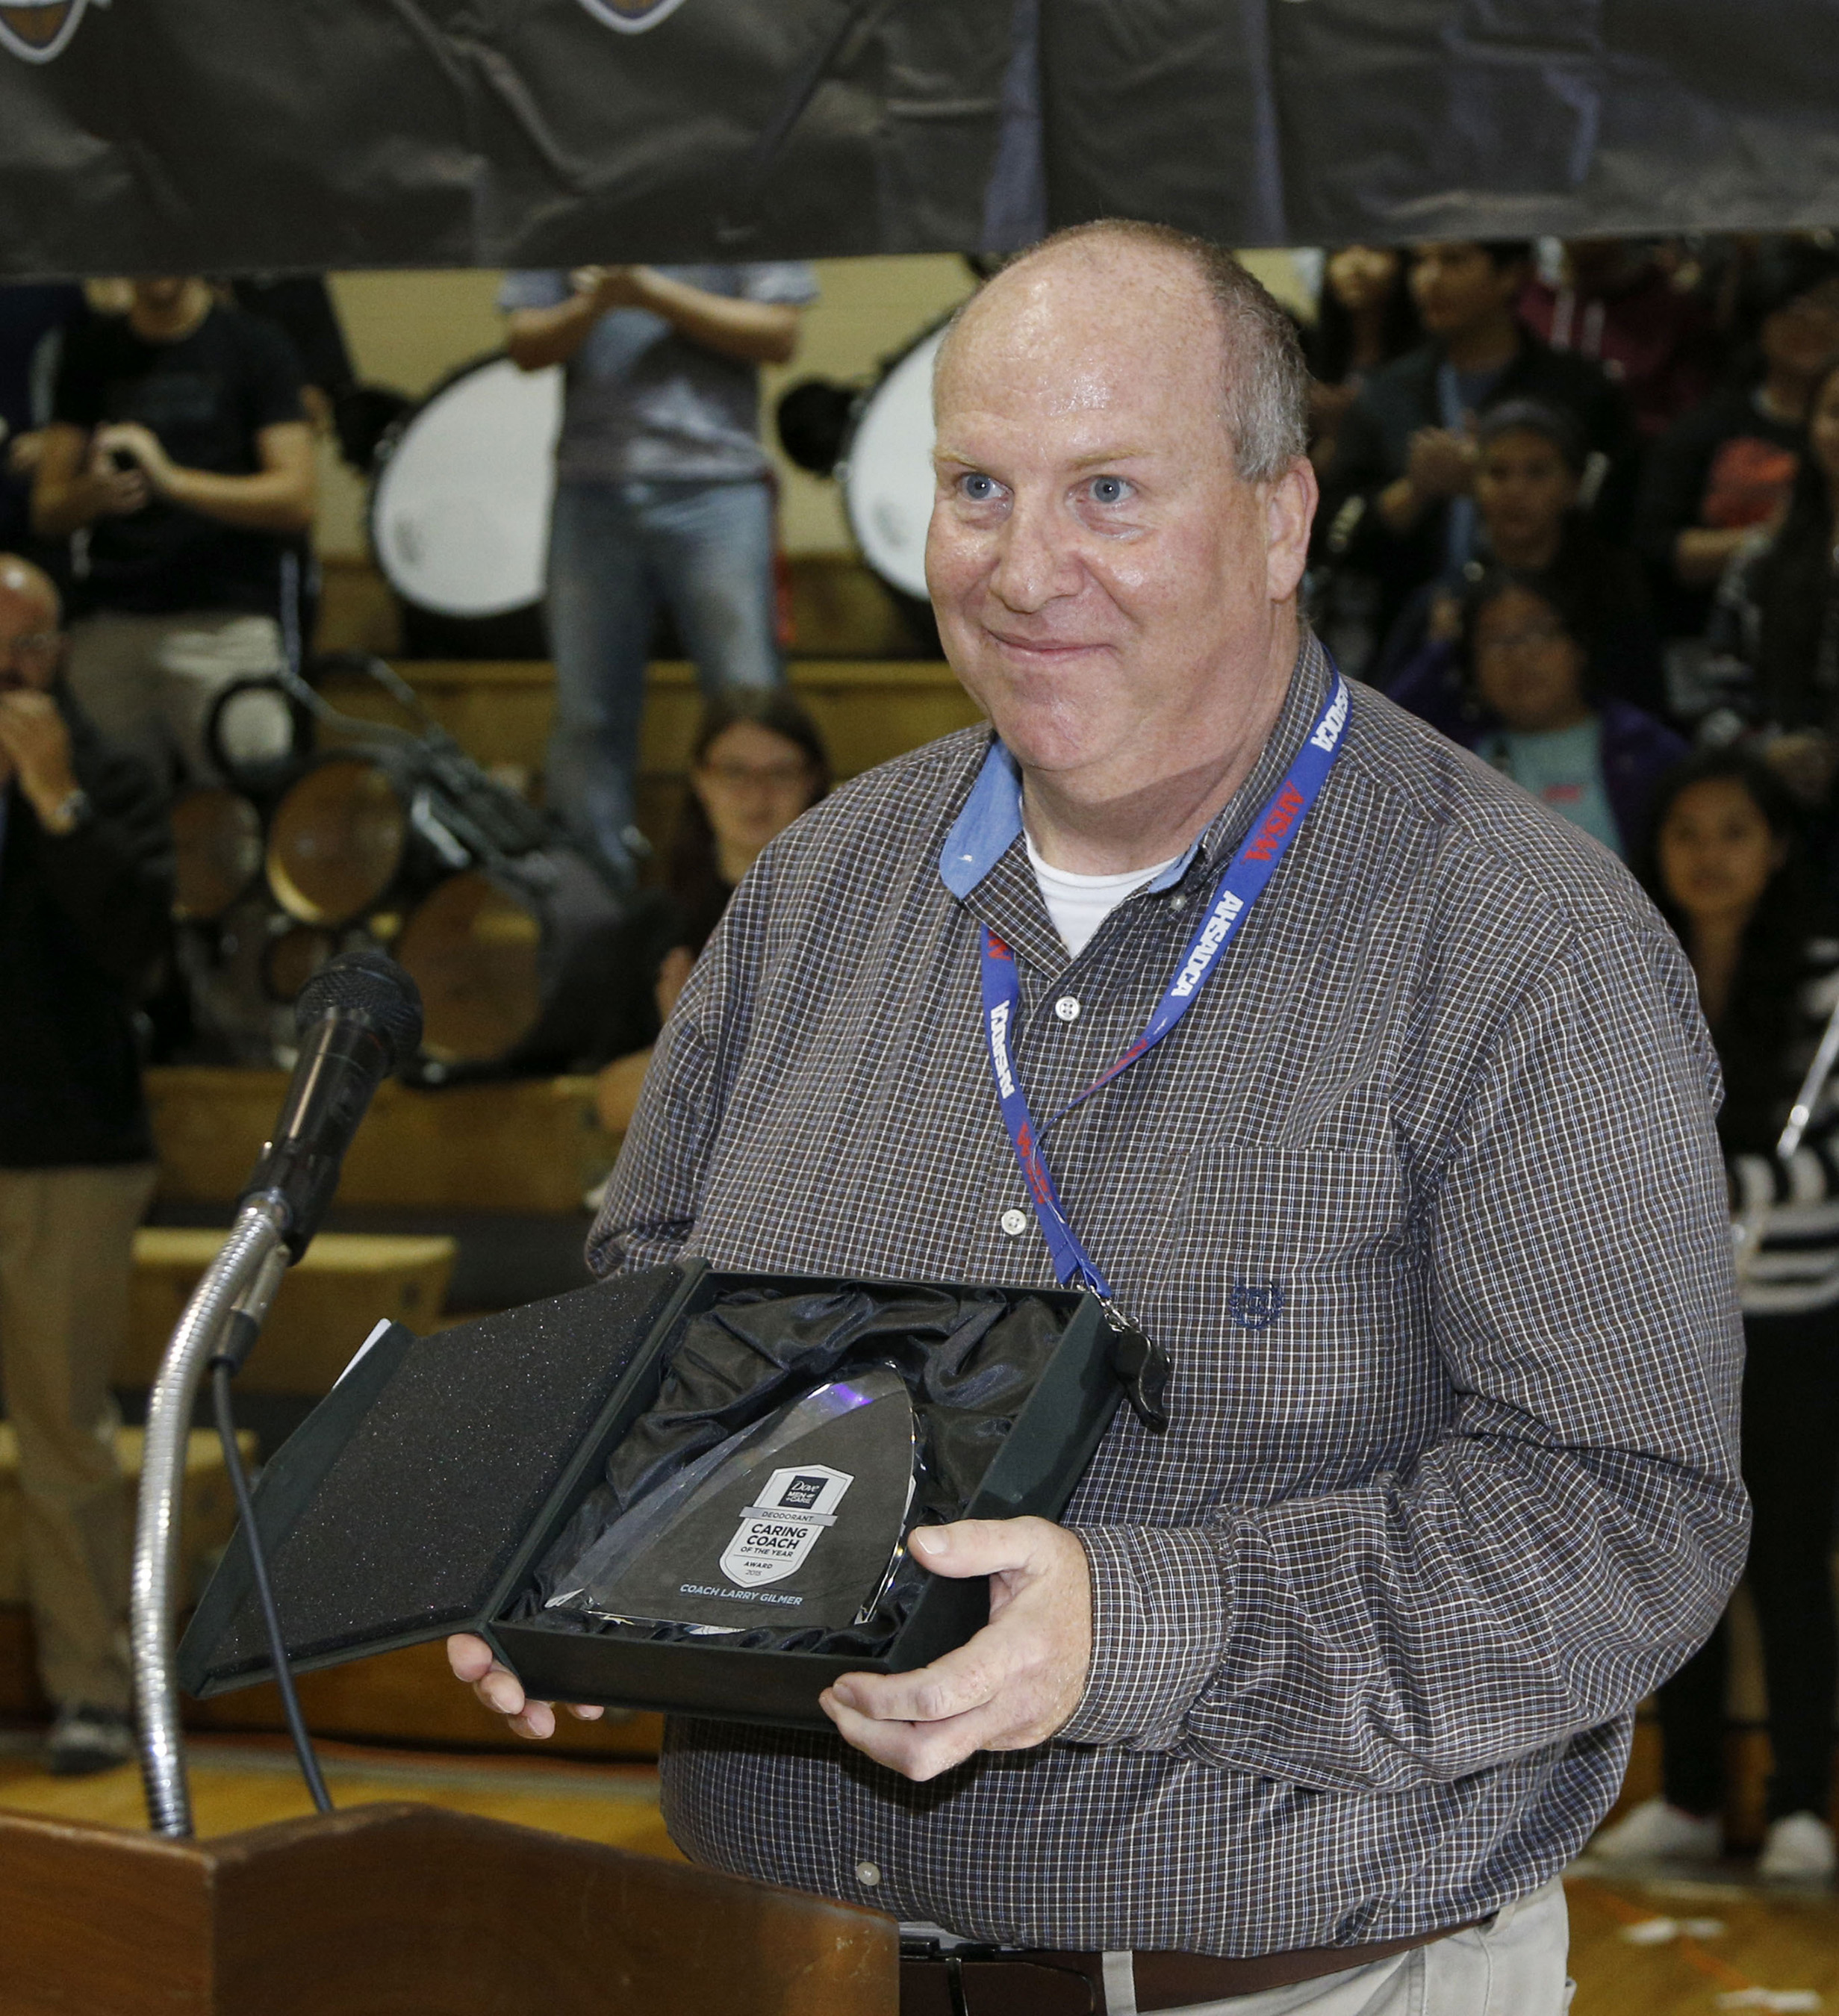 Coach Larry Gilmer, head football coach of Russellville Middle School in Russellville, AL